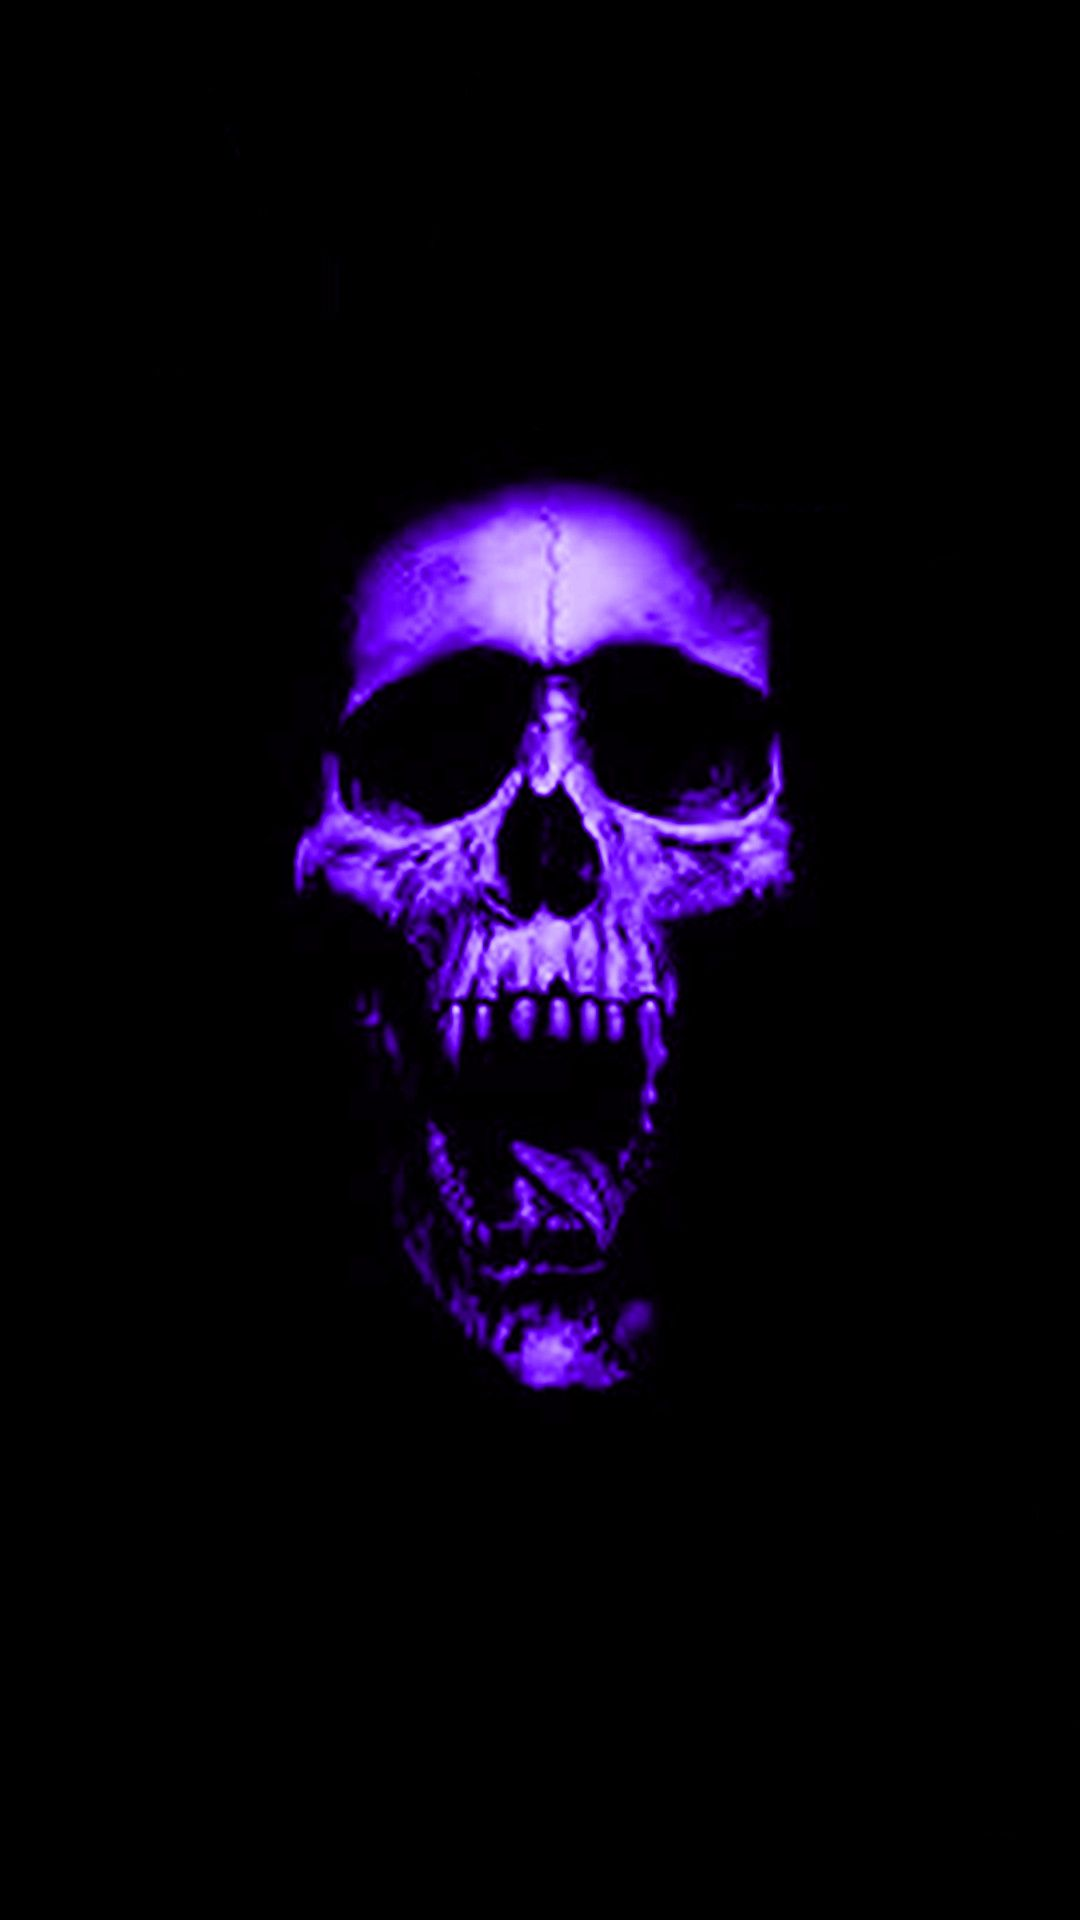 Aesthetic Black And Purple Wallpaper Hd Black And Purple Wallpaper Skull Wallpaper Purple Wallpaper Hd